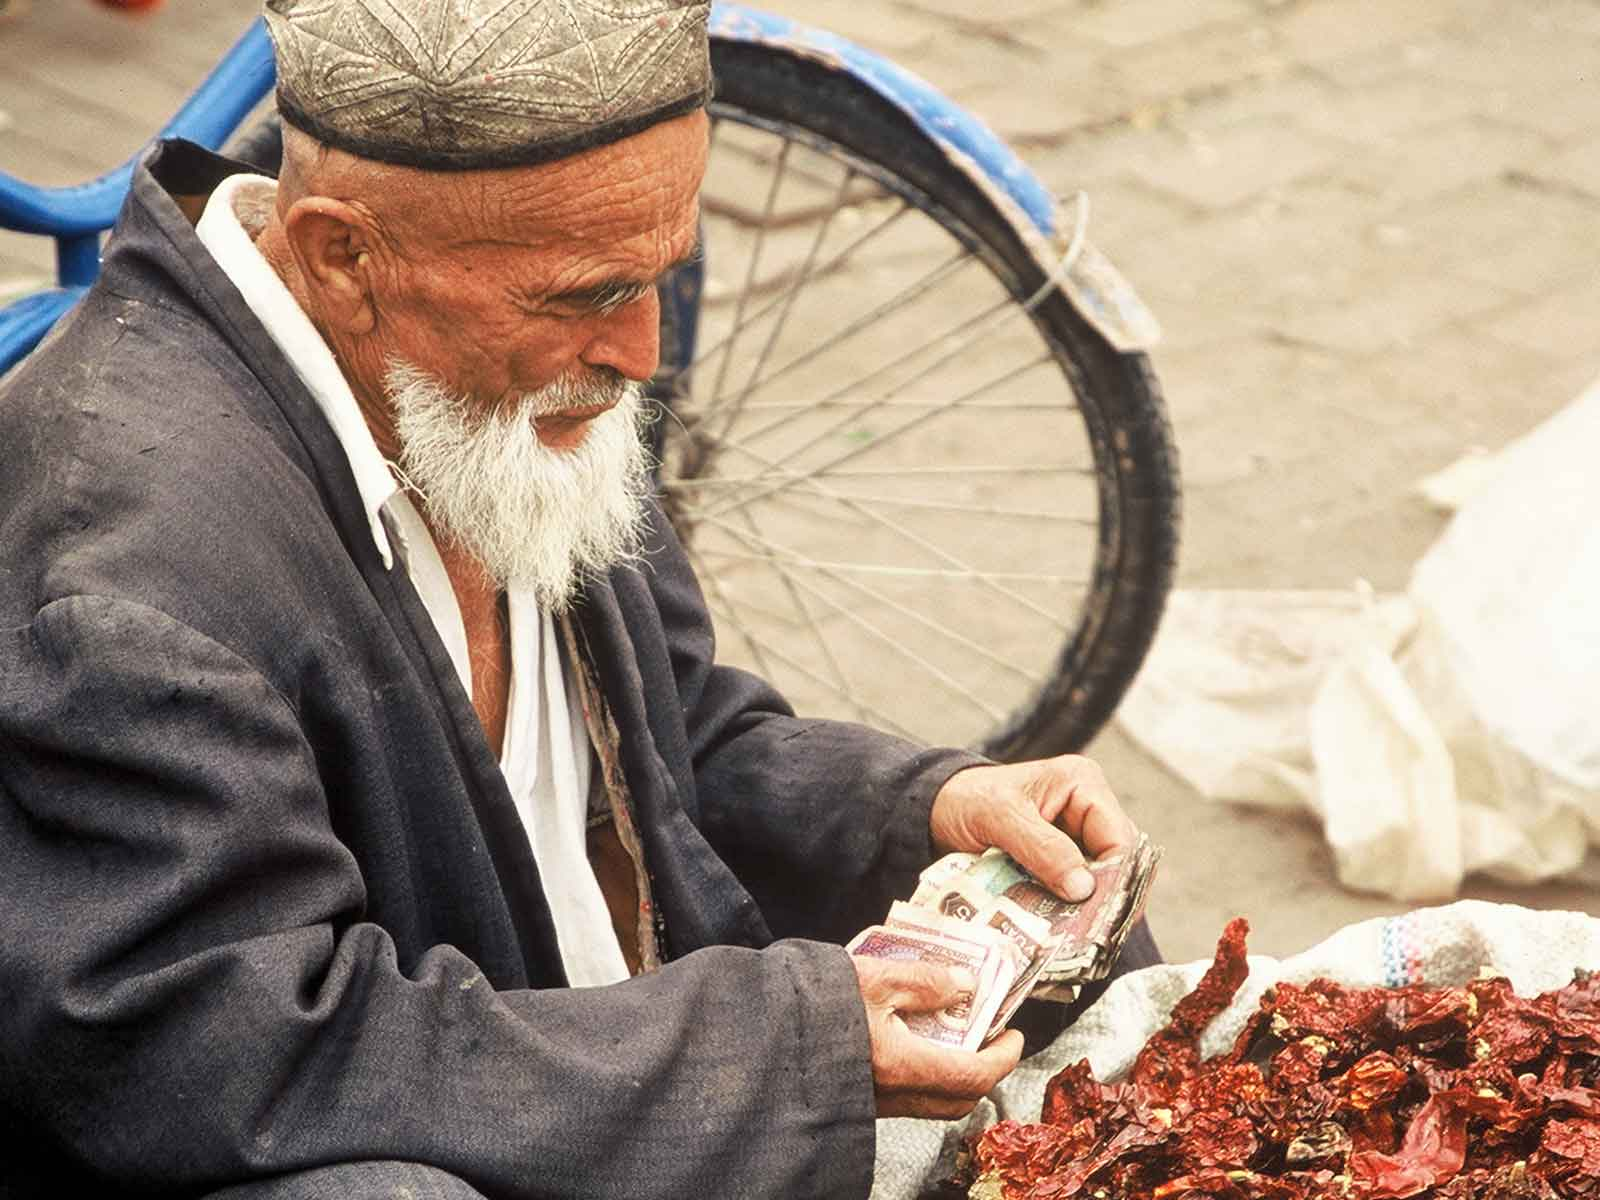 Hot Peppers - Kashgar Bazaar - China Silk Road Photo Journal - Dr Steven Andrew Martin